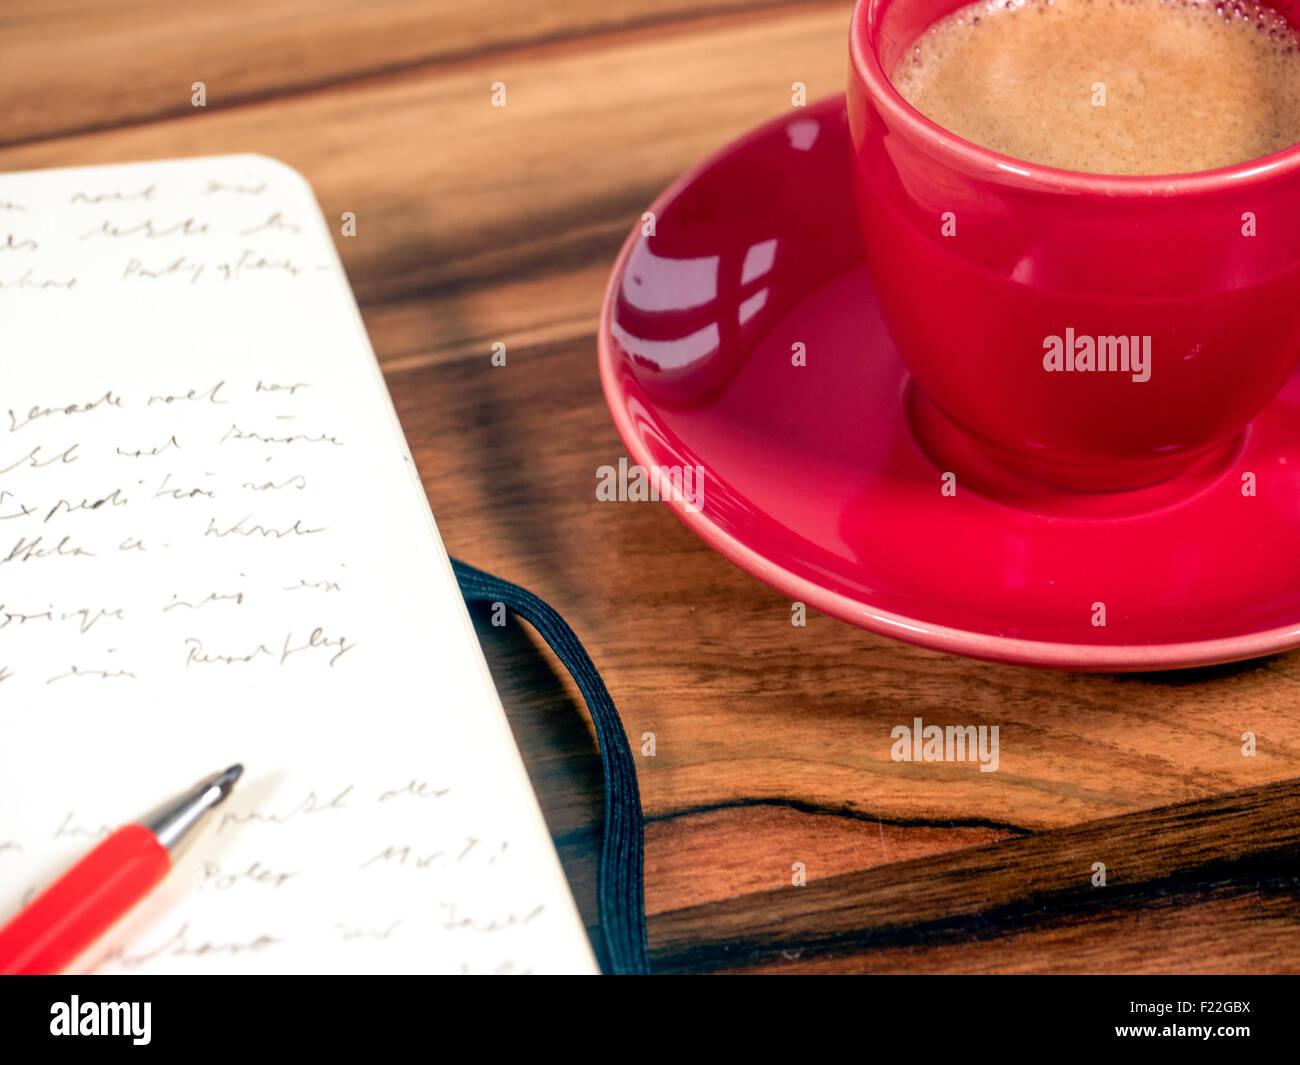 Notizbuch mit Kaffeetasse - Stock Image